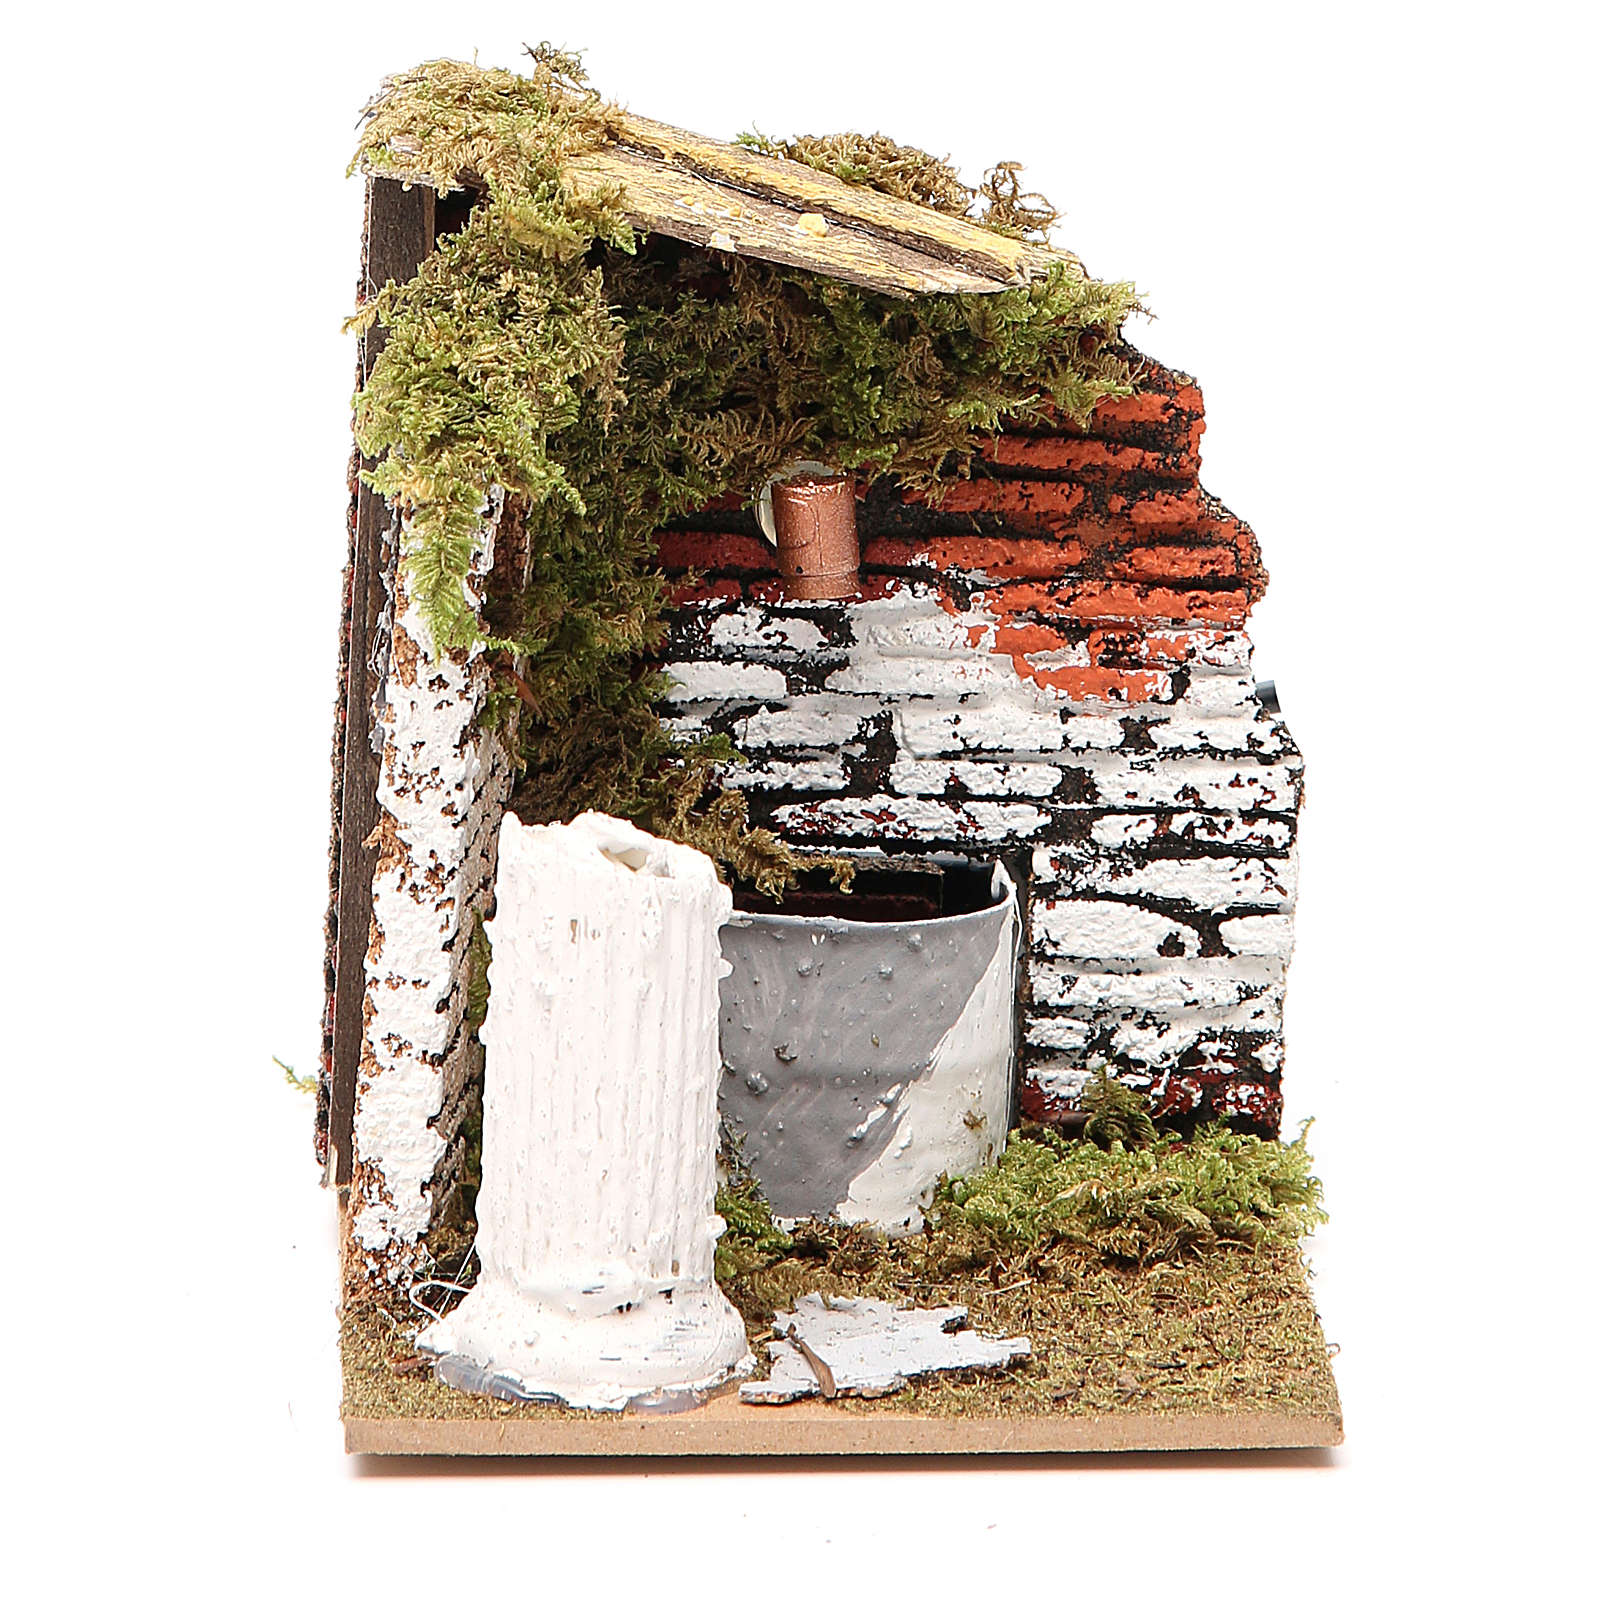 Fontana presepe legno e sughero 12x15x10 cm modelli assortiti 4